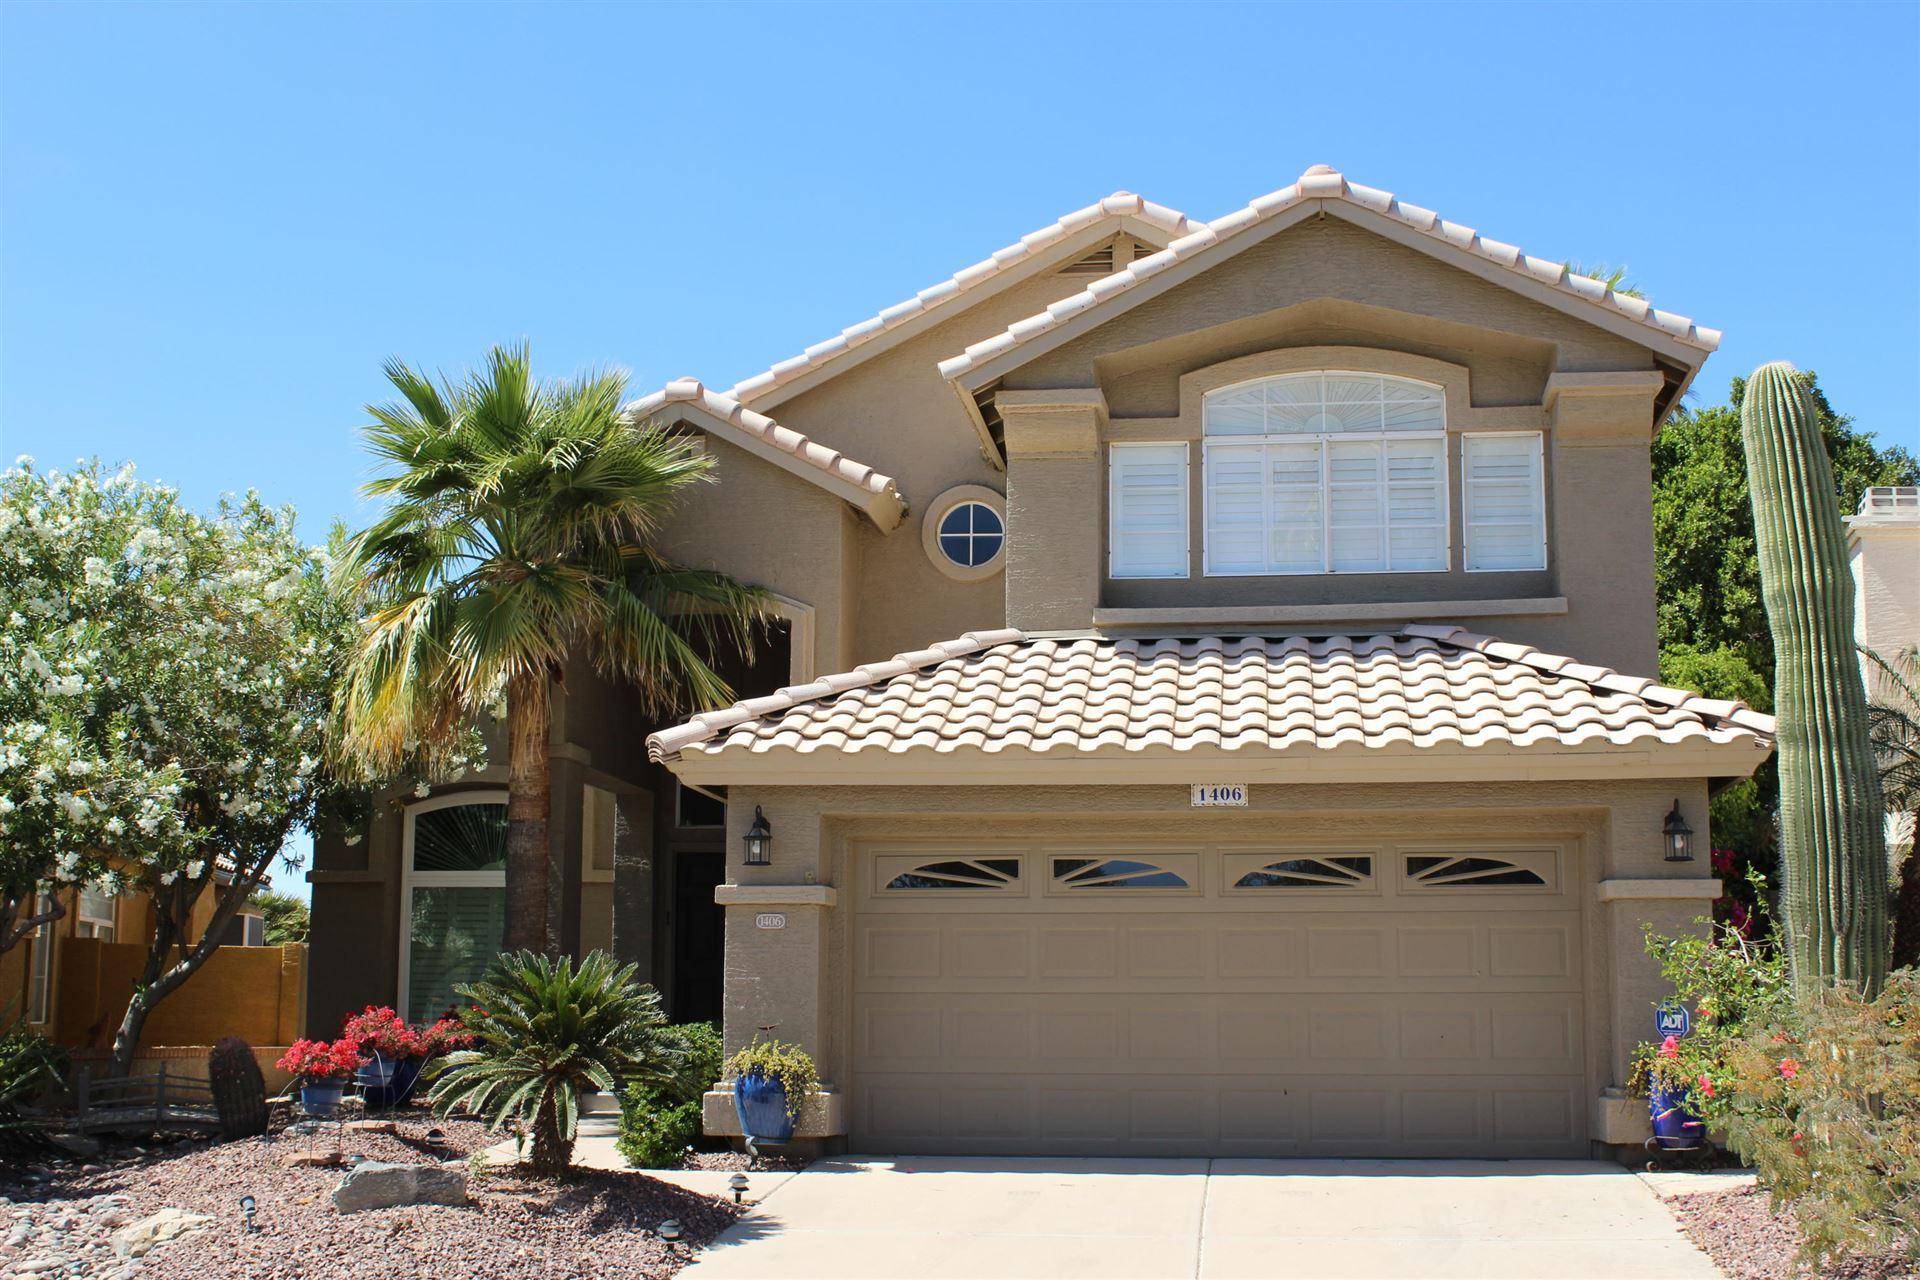 1406 E NIGHTHAWK Way, Phoenix, AZ 85048 - #: 6226764